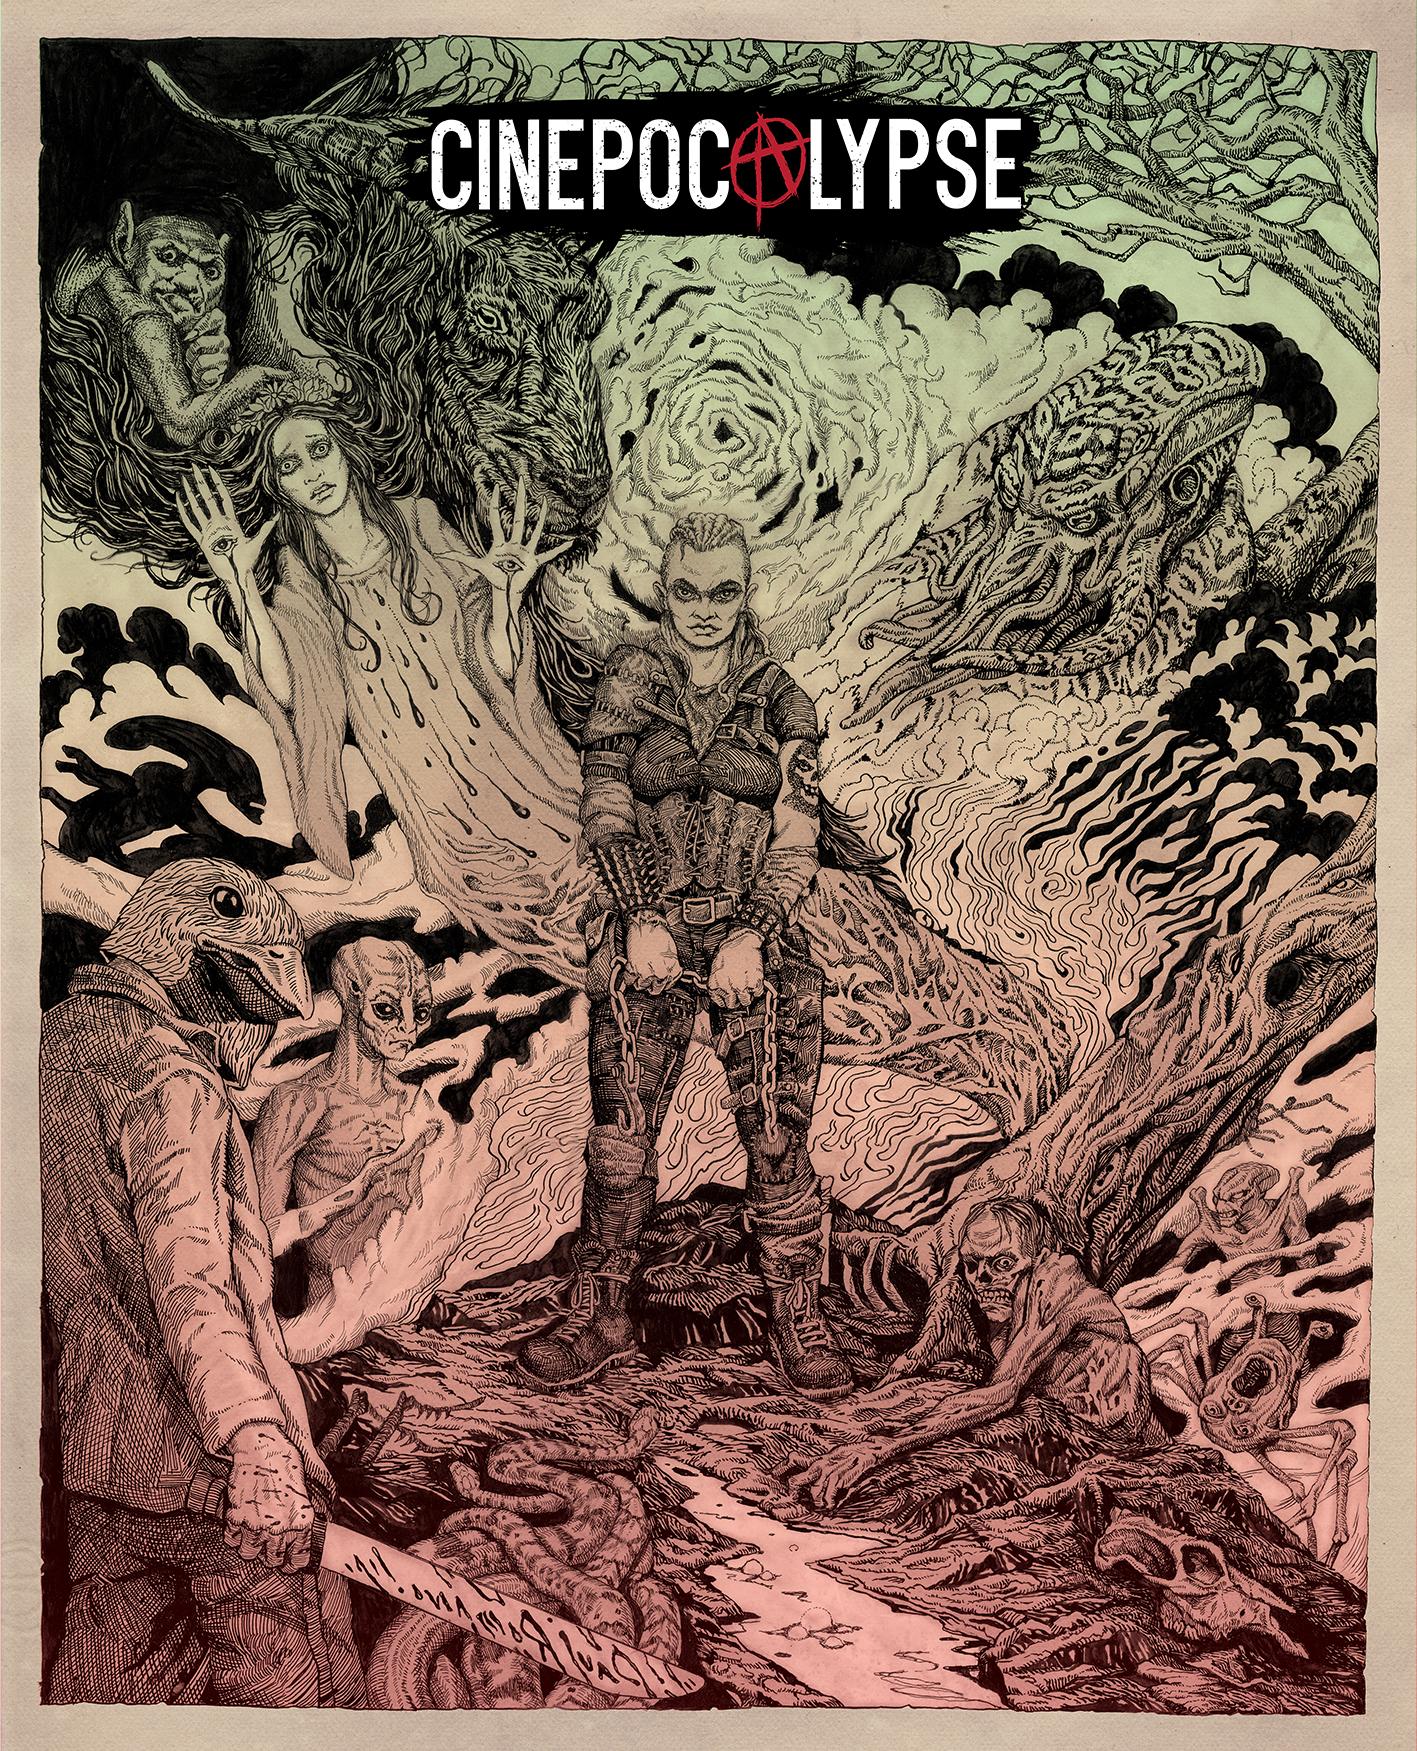 cinepocalypse-poster.jpg